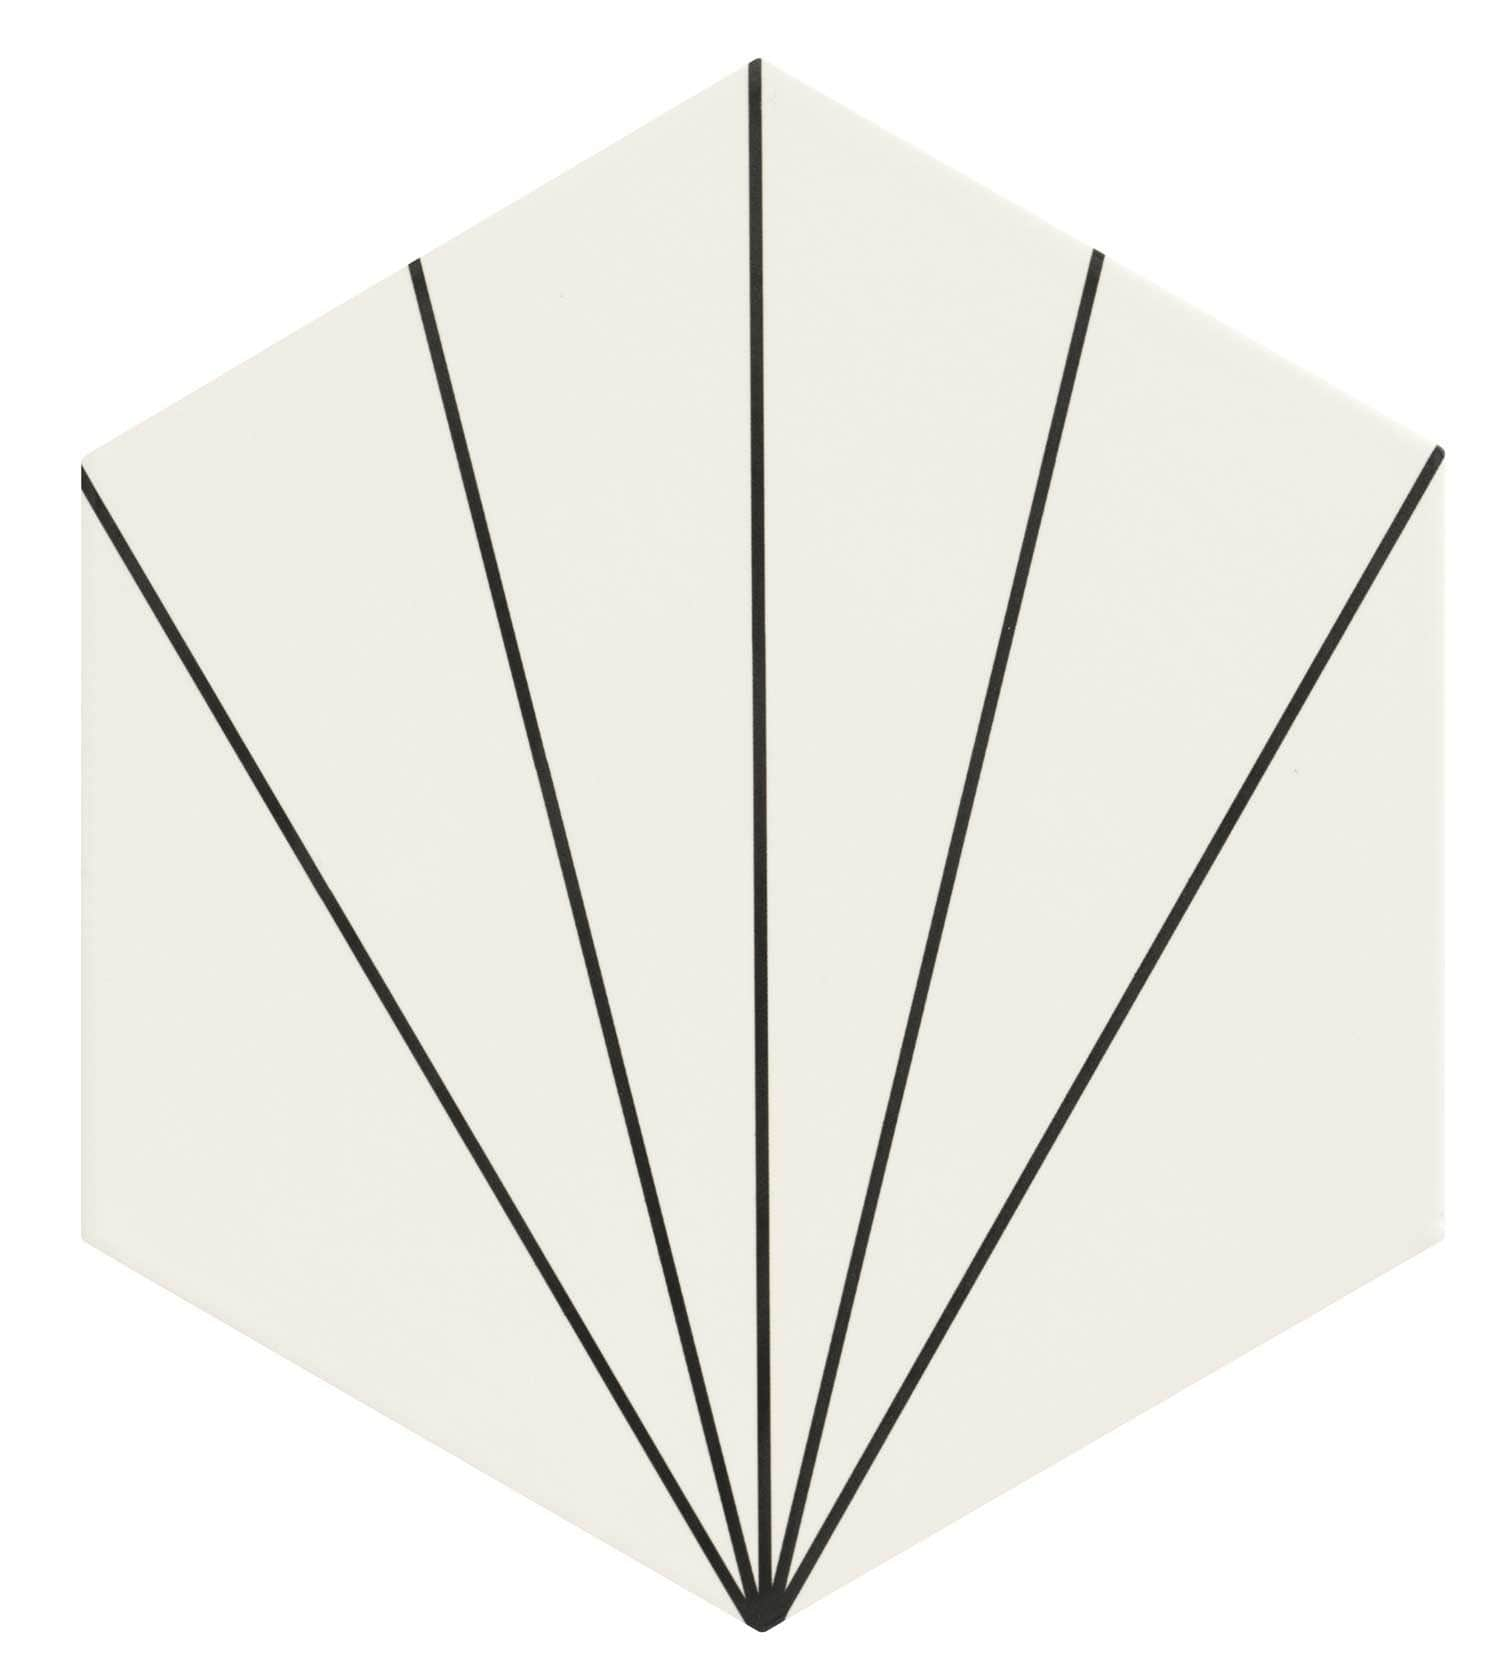 Carreau tomette blanc dandelion 33x28.5 VENUS WHITE - 1m² - zoom